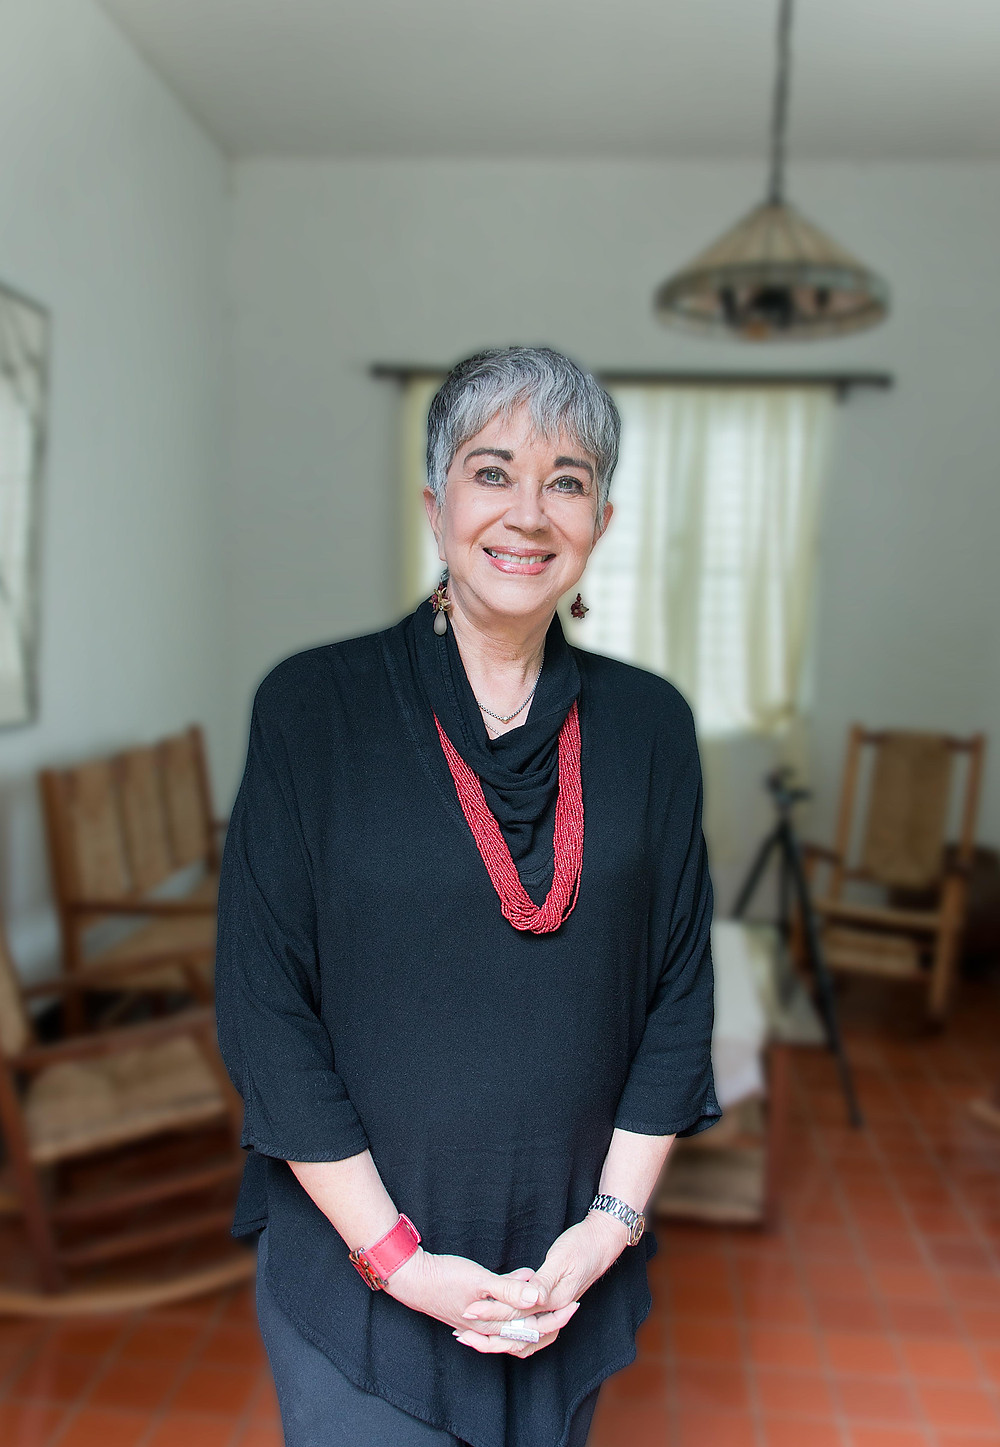 Dra. Margarita Ostolaza